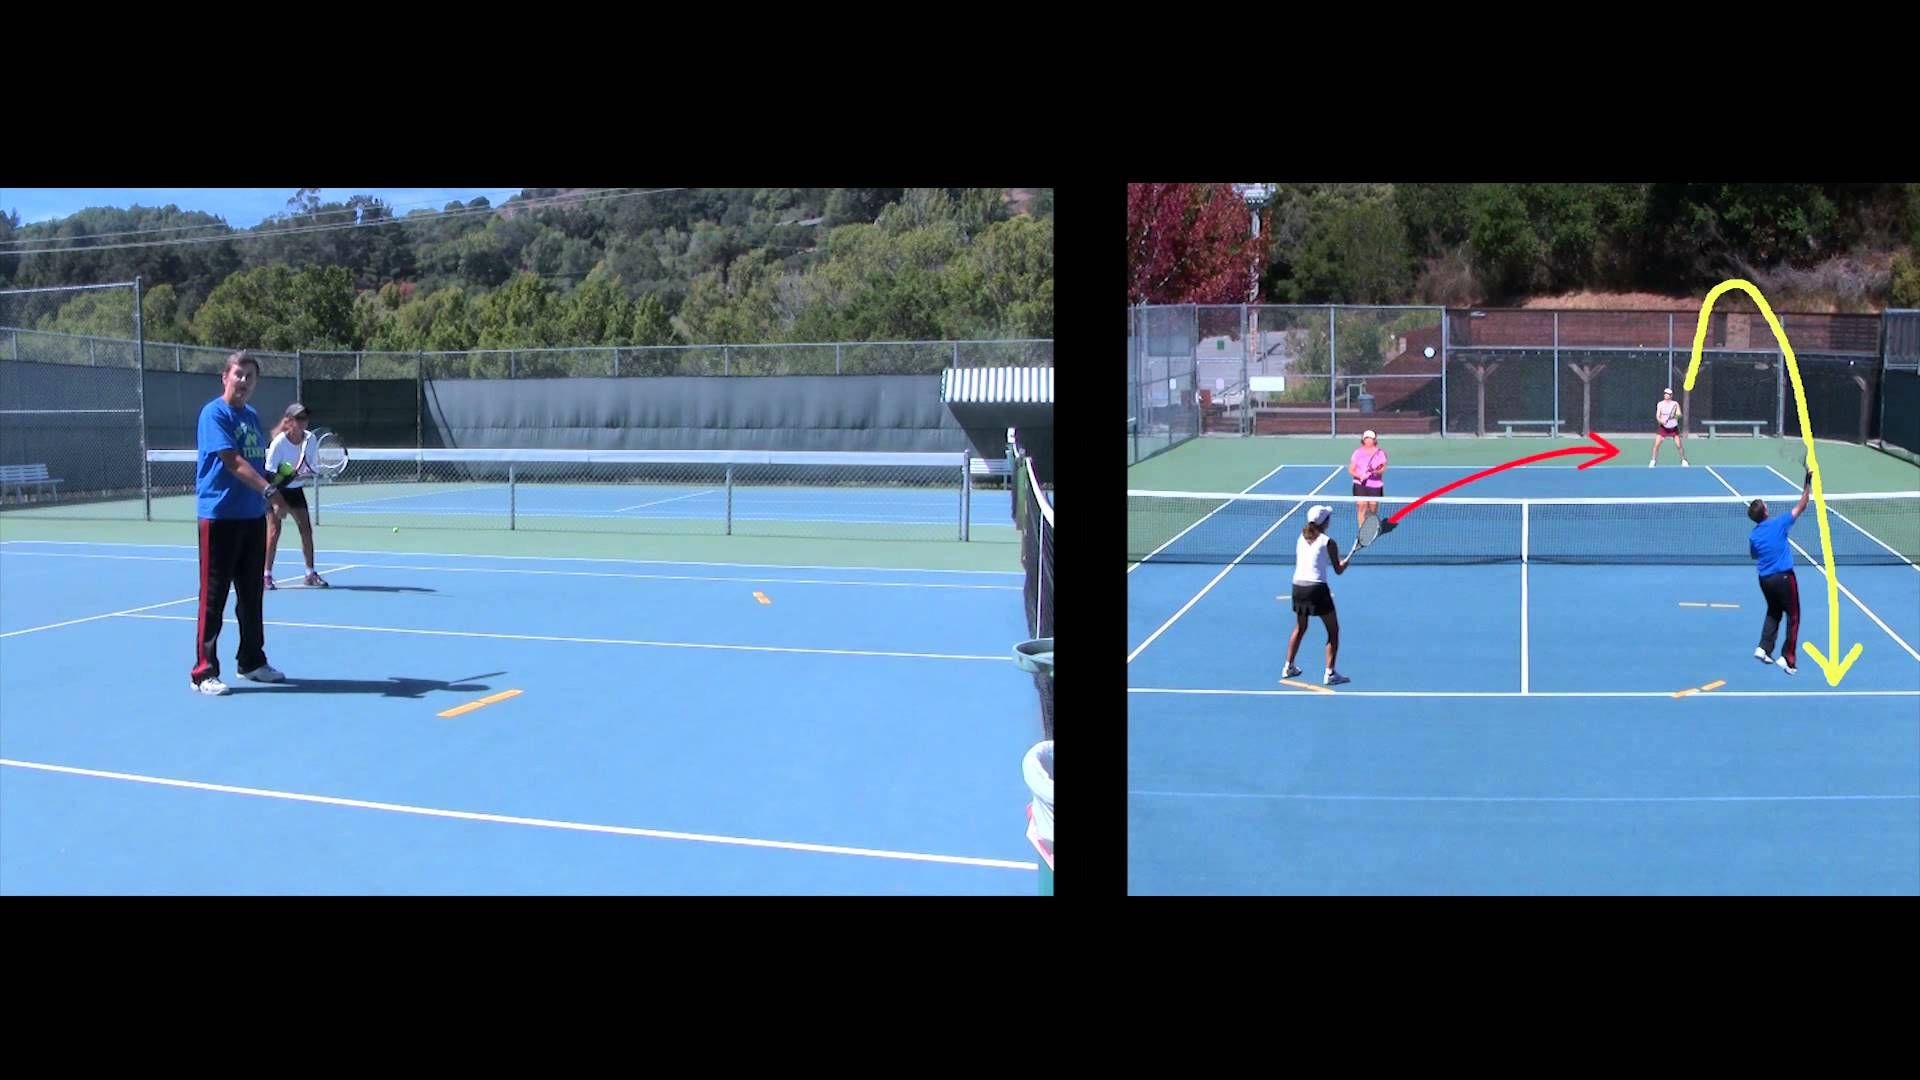 Helle Tennis Tips Terminator S Position Depends On Lob Or Drive Tennis Tips Terminator Tennis